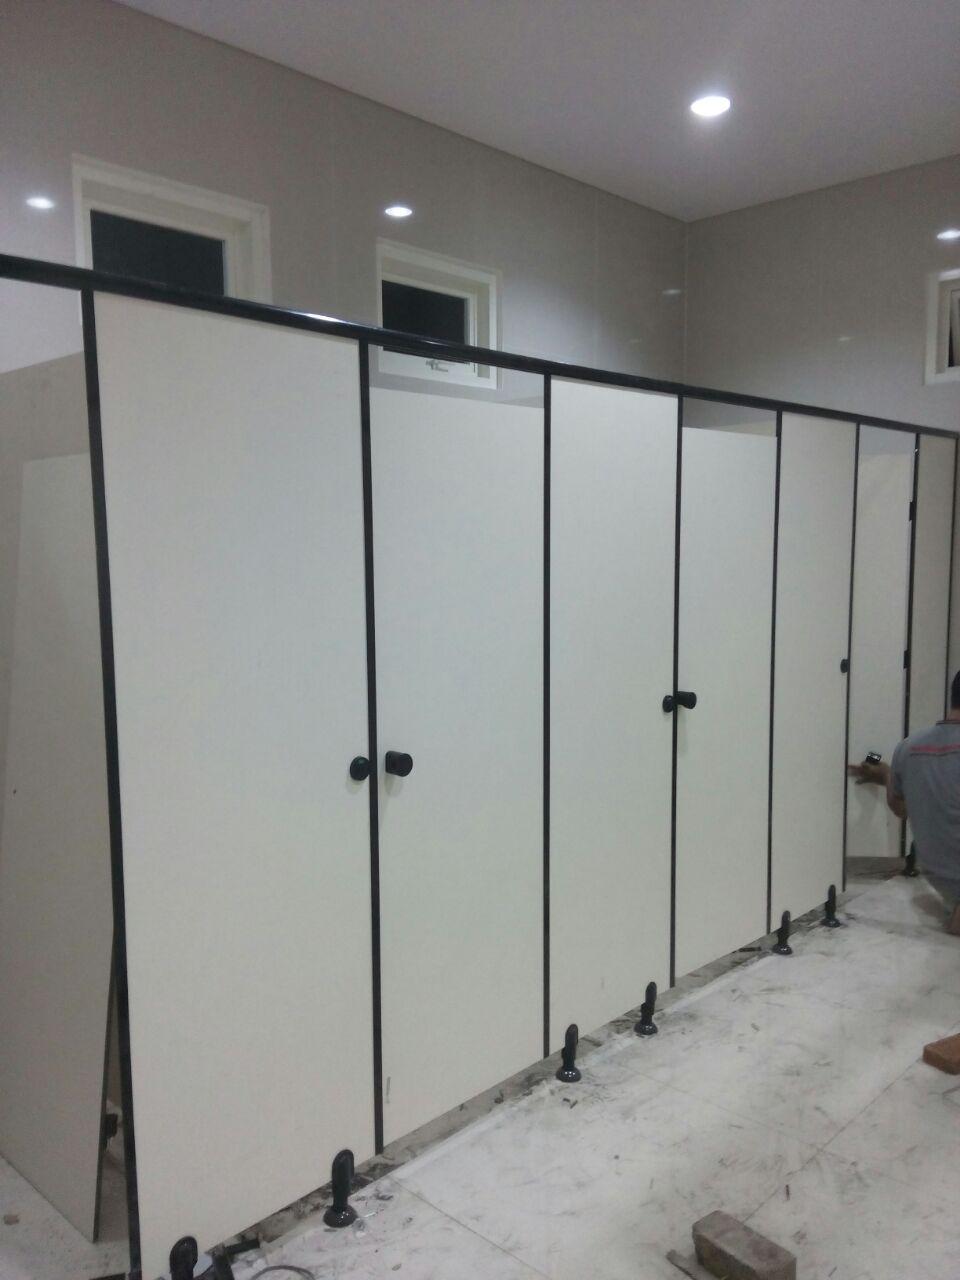 ToiletcubicleuntukSMAMuhammadiyah10-3